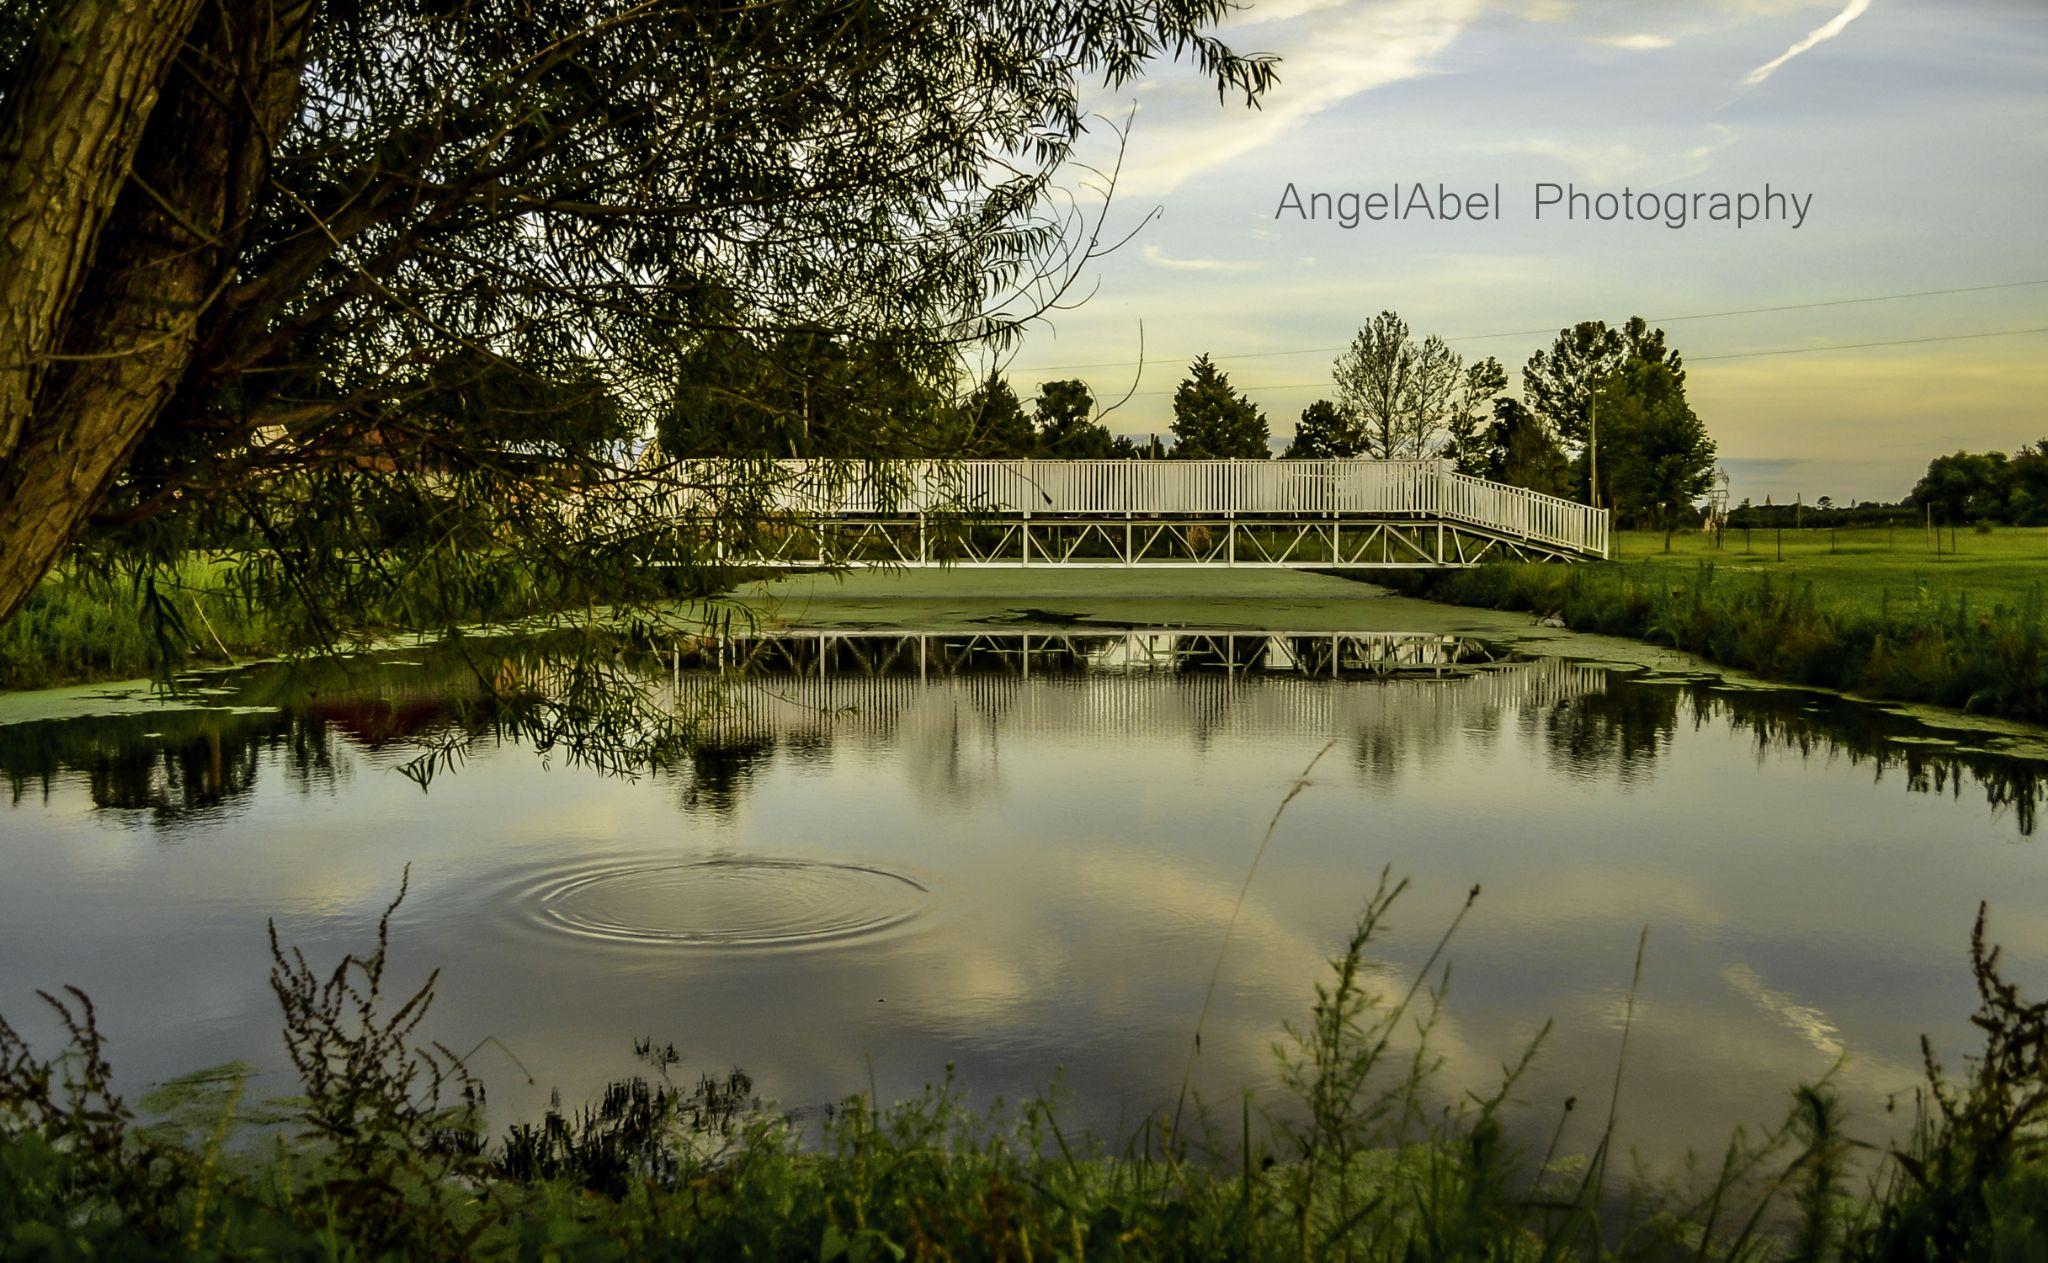 www.facebook.com/AngelAbelPhotography by AngelAbelPhotography